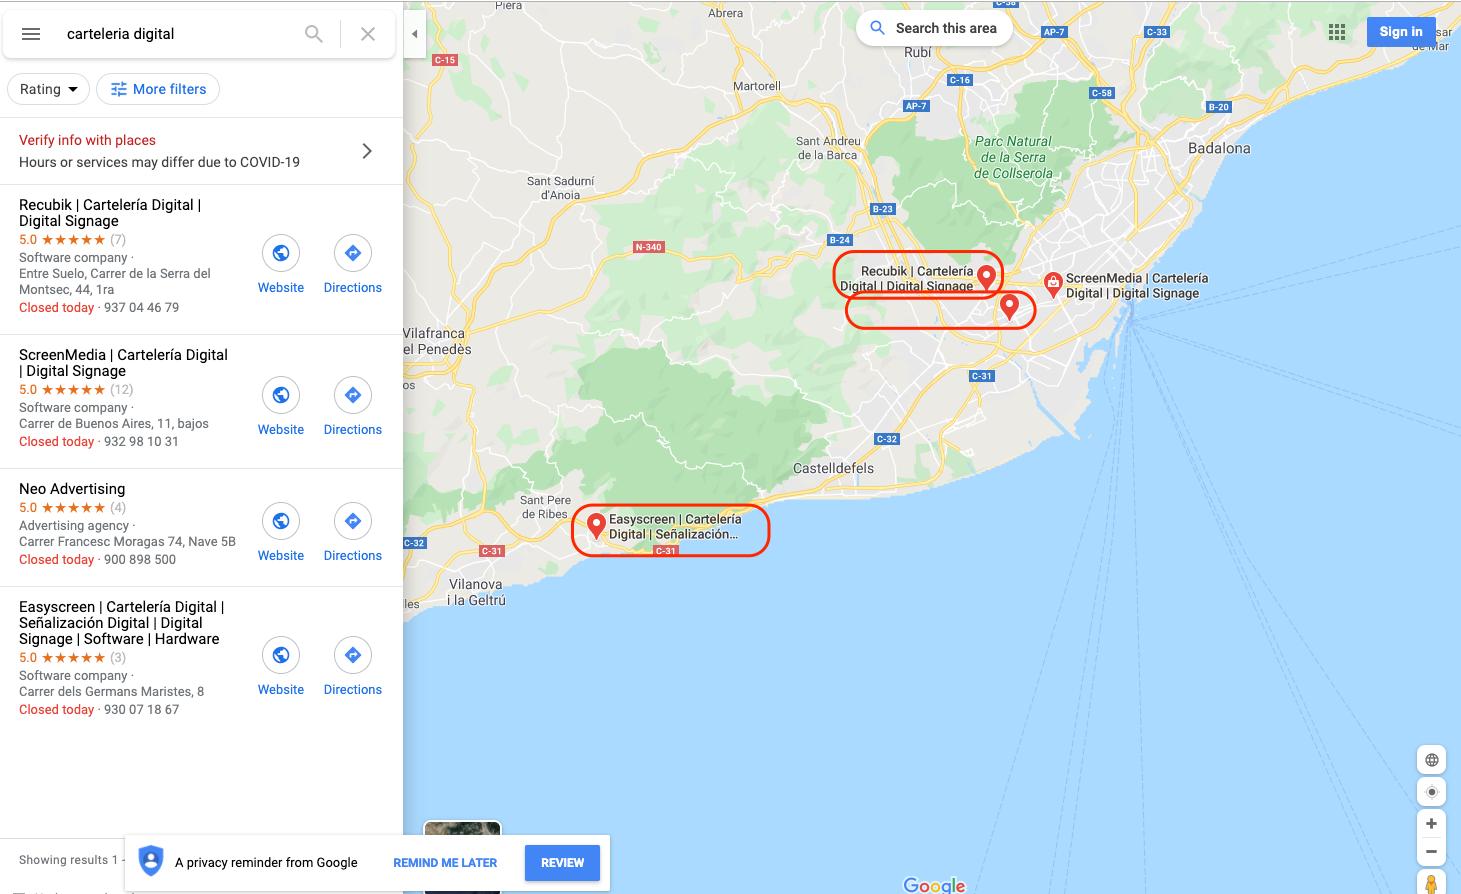 carteleria_digital_-_Google_Maps6.png